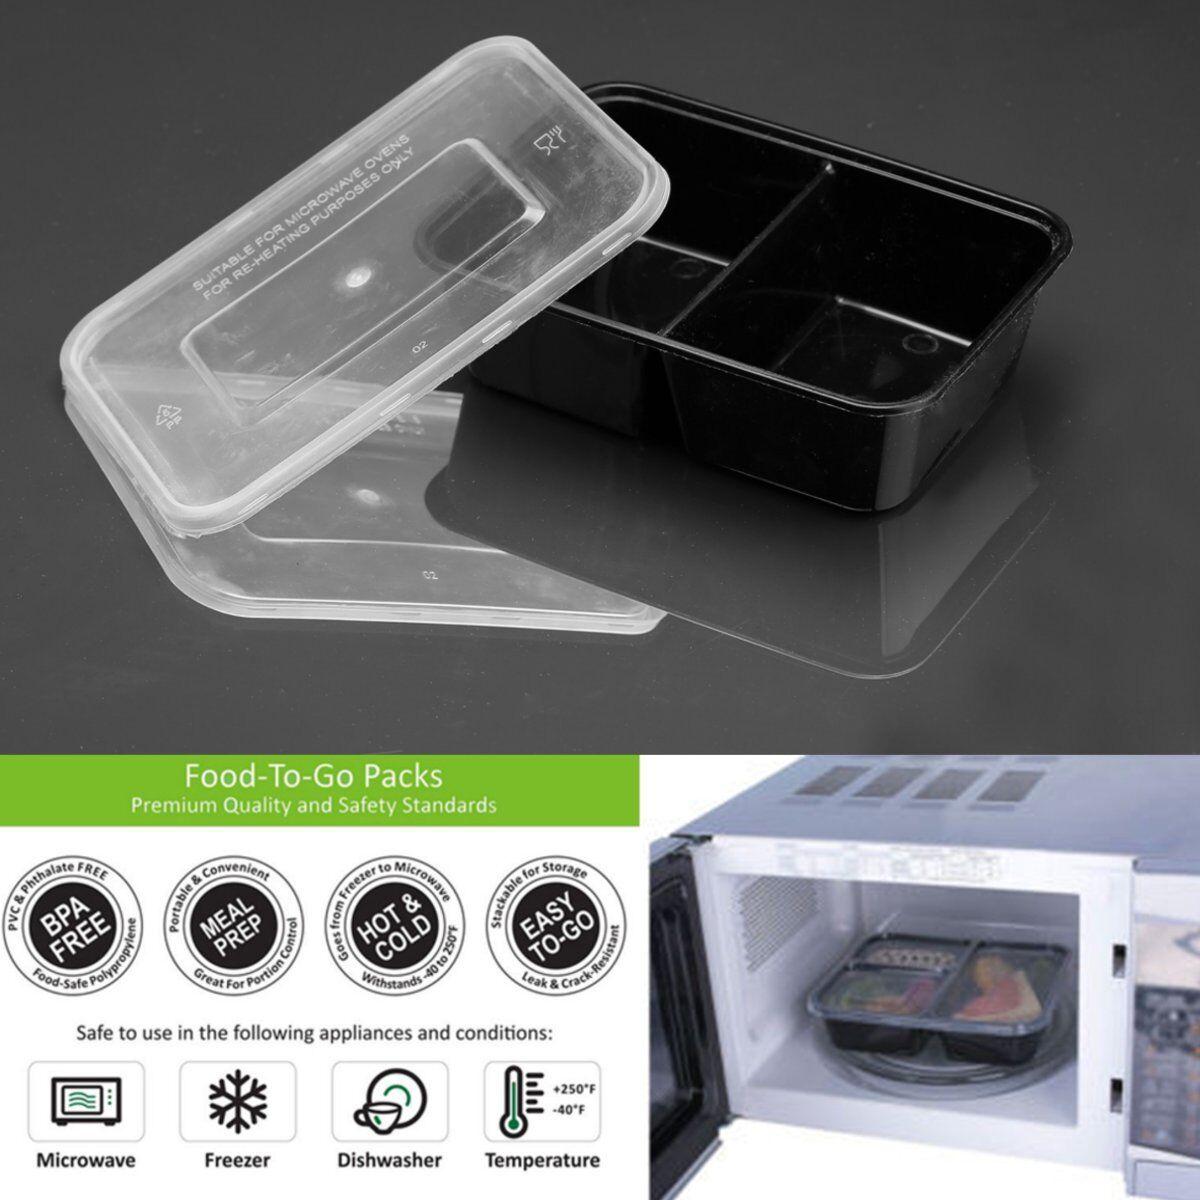 10x Meal Prep Container Kunststoff Lebensmittel Aufbewahrung Mikrowellengeeignet